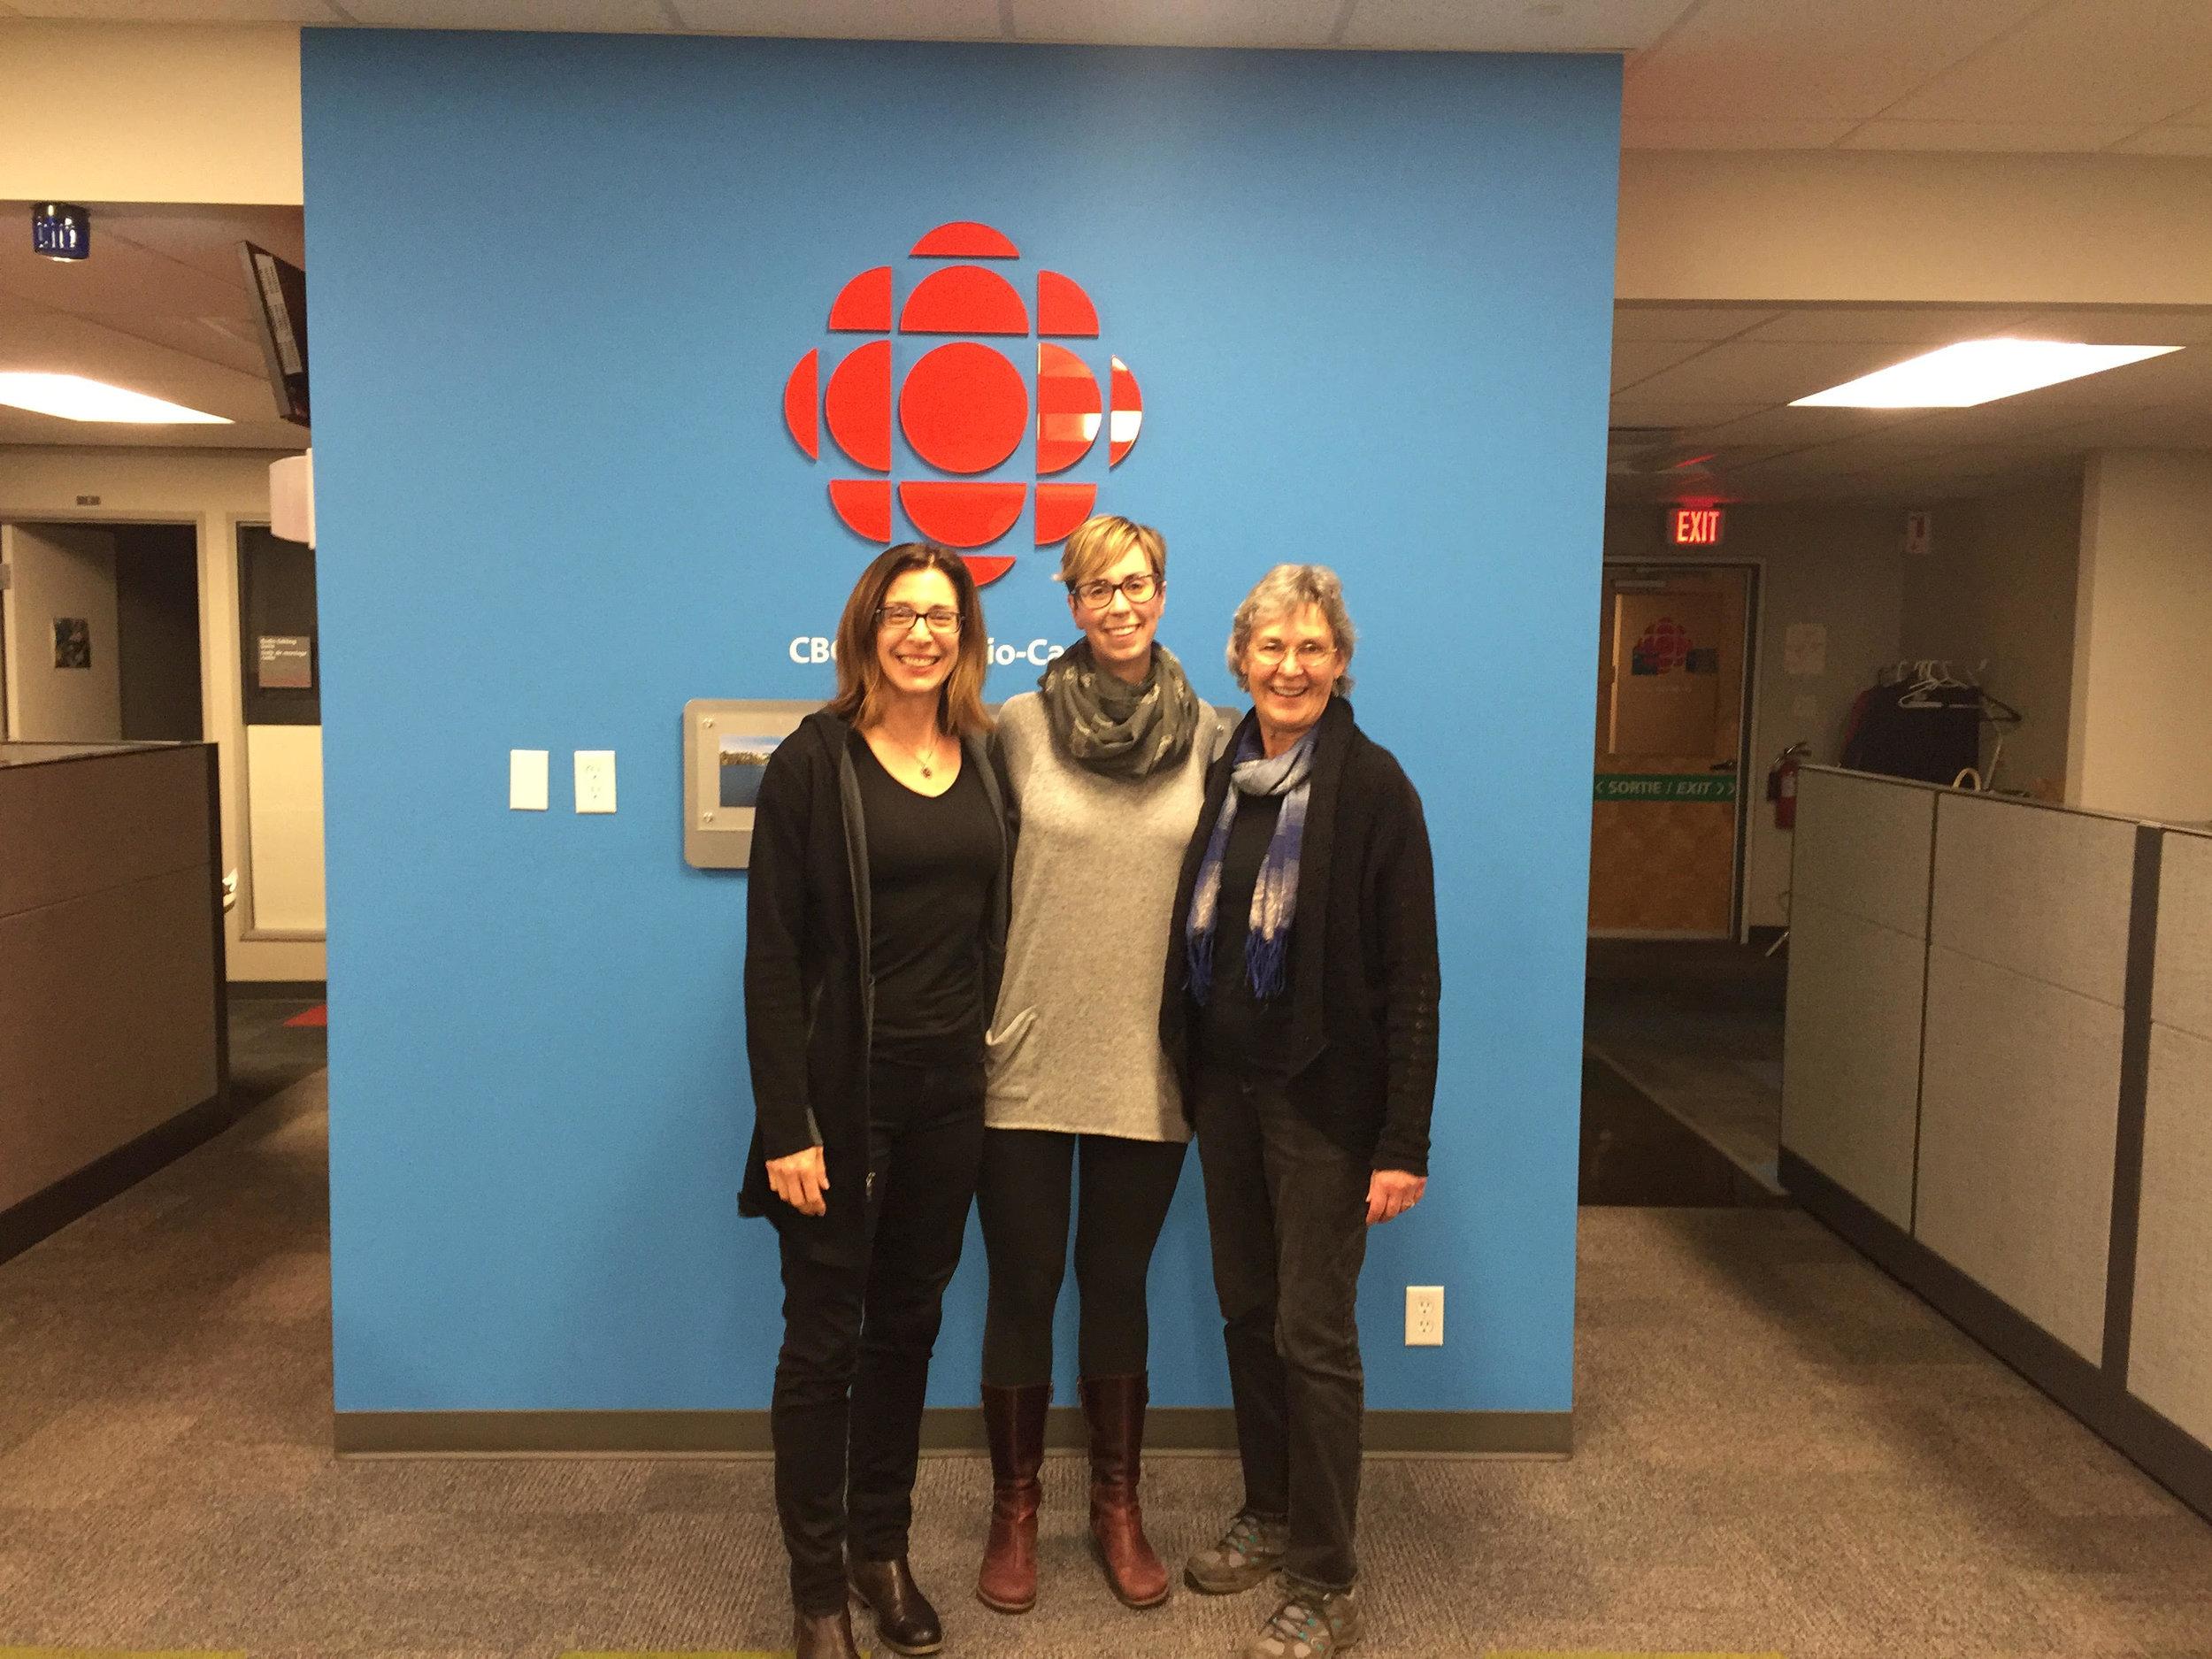 CBC_24_Feb_2016.jpg